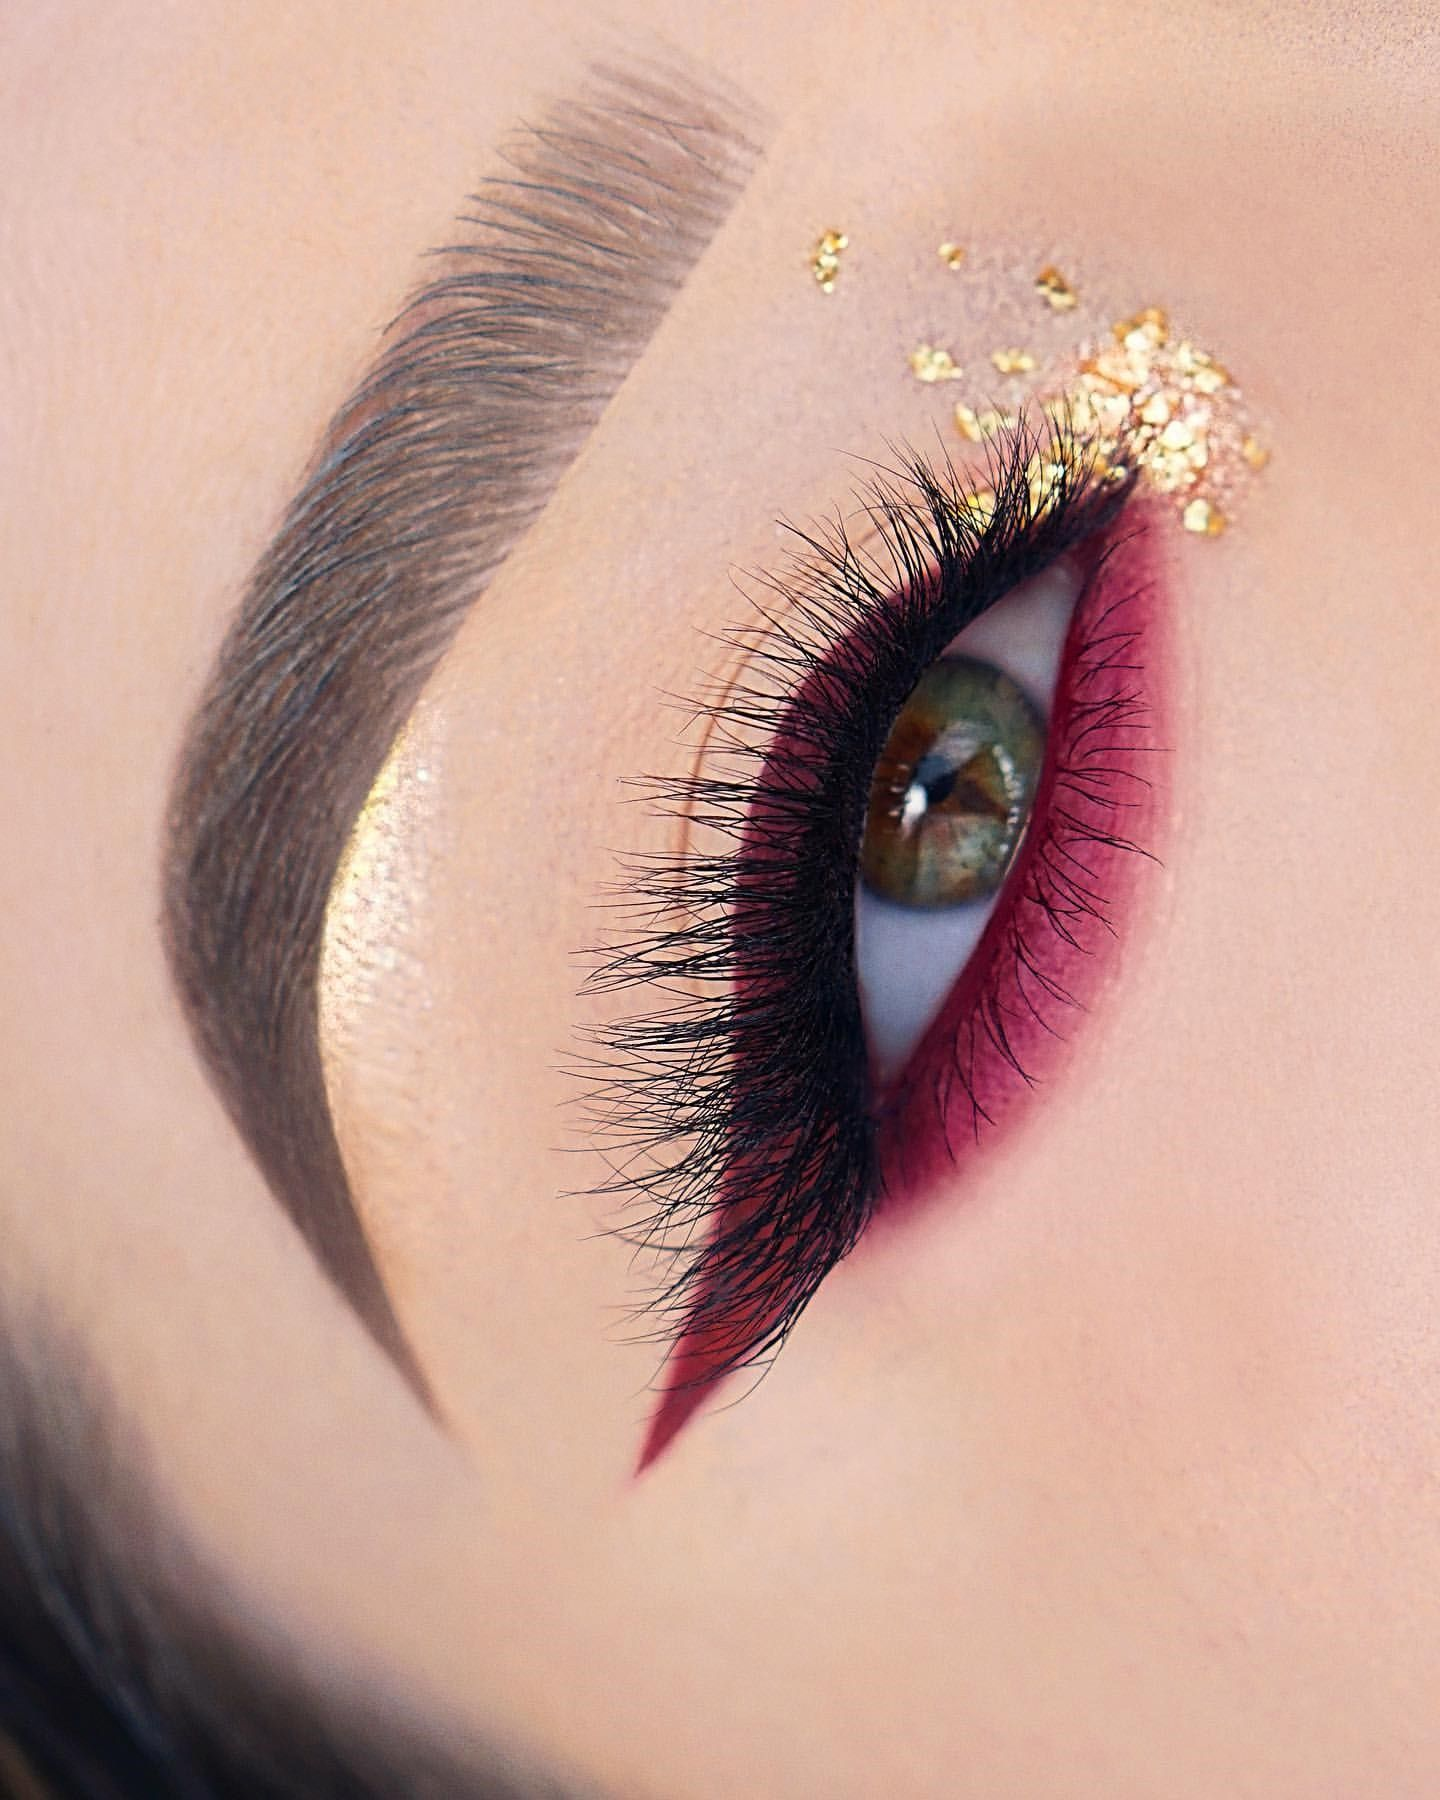 Pin By Keira Geering On Makeup Art In 2020 Colorful Eye Makeup